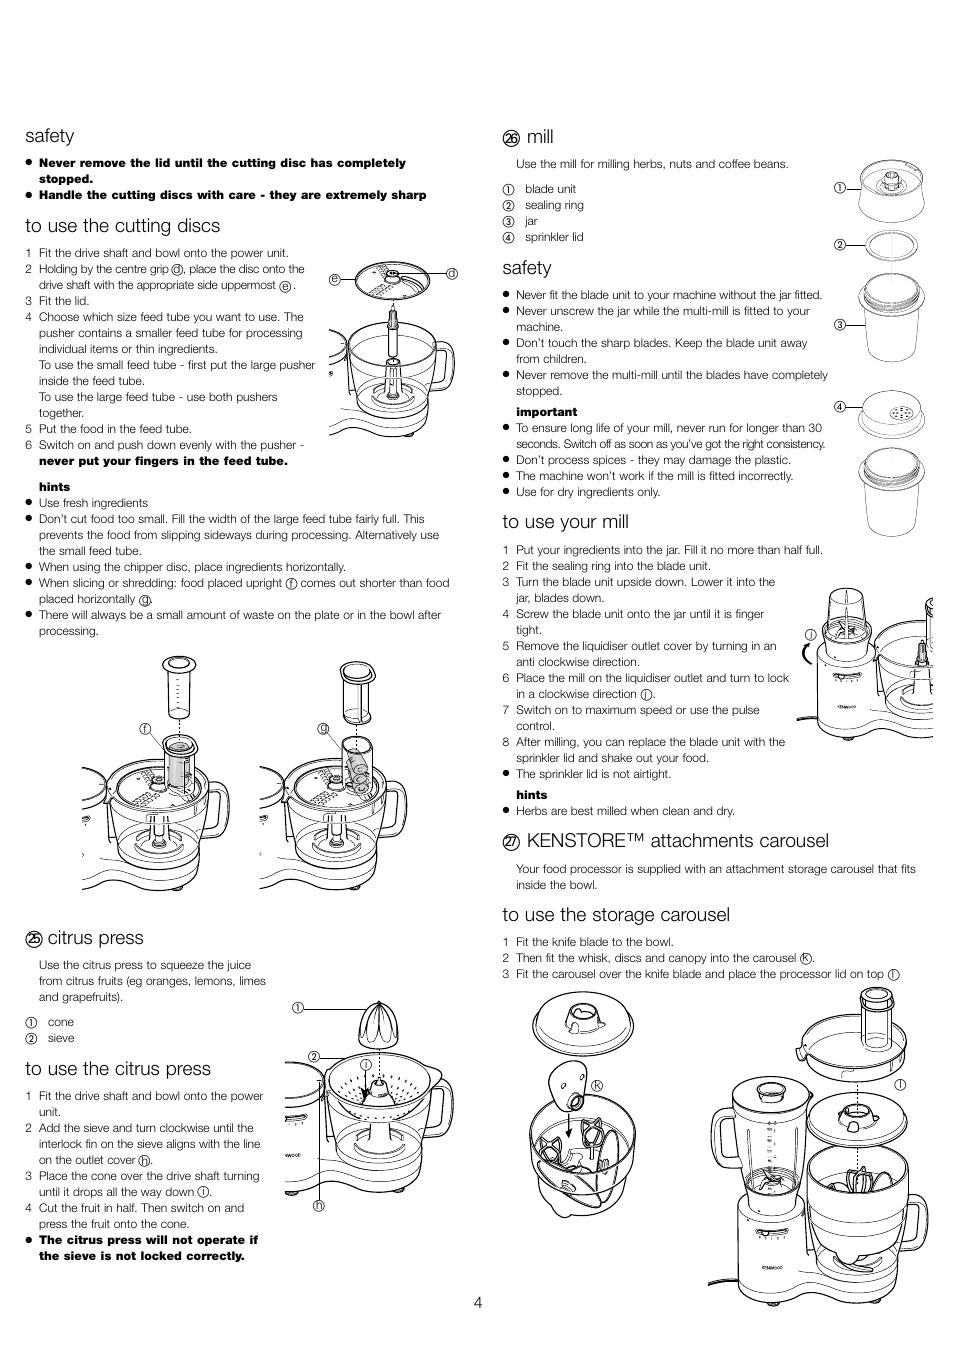 safety citrus press mill kenwood fp520 series user manual page rh manualsdir com